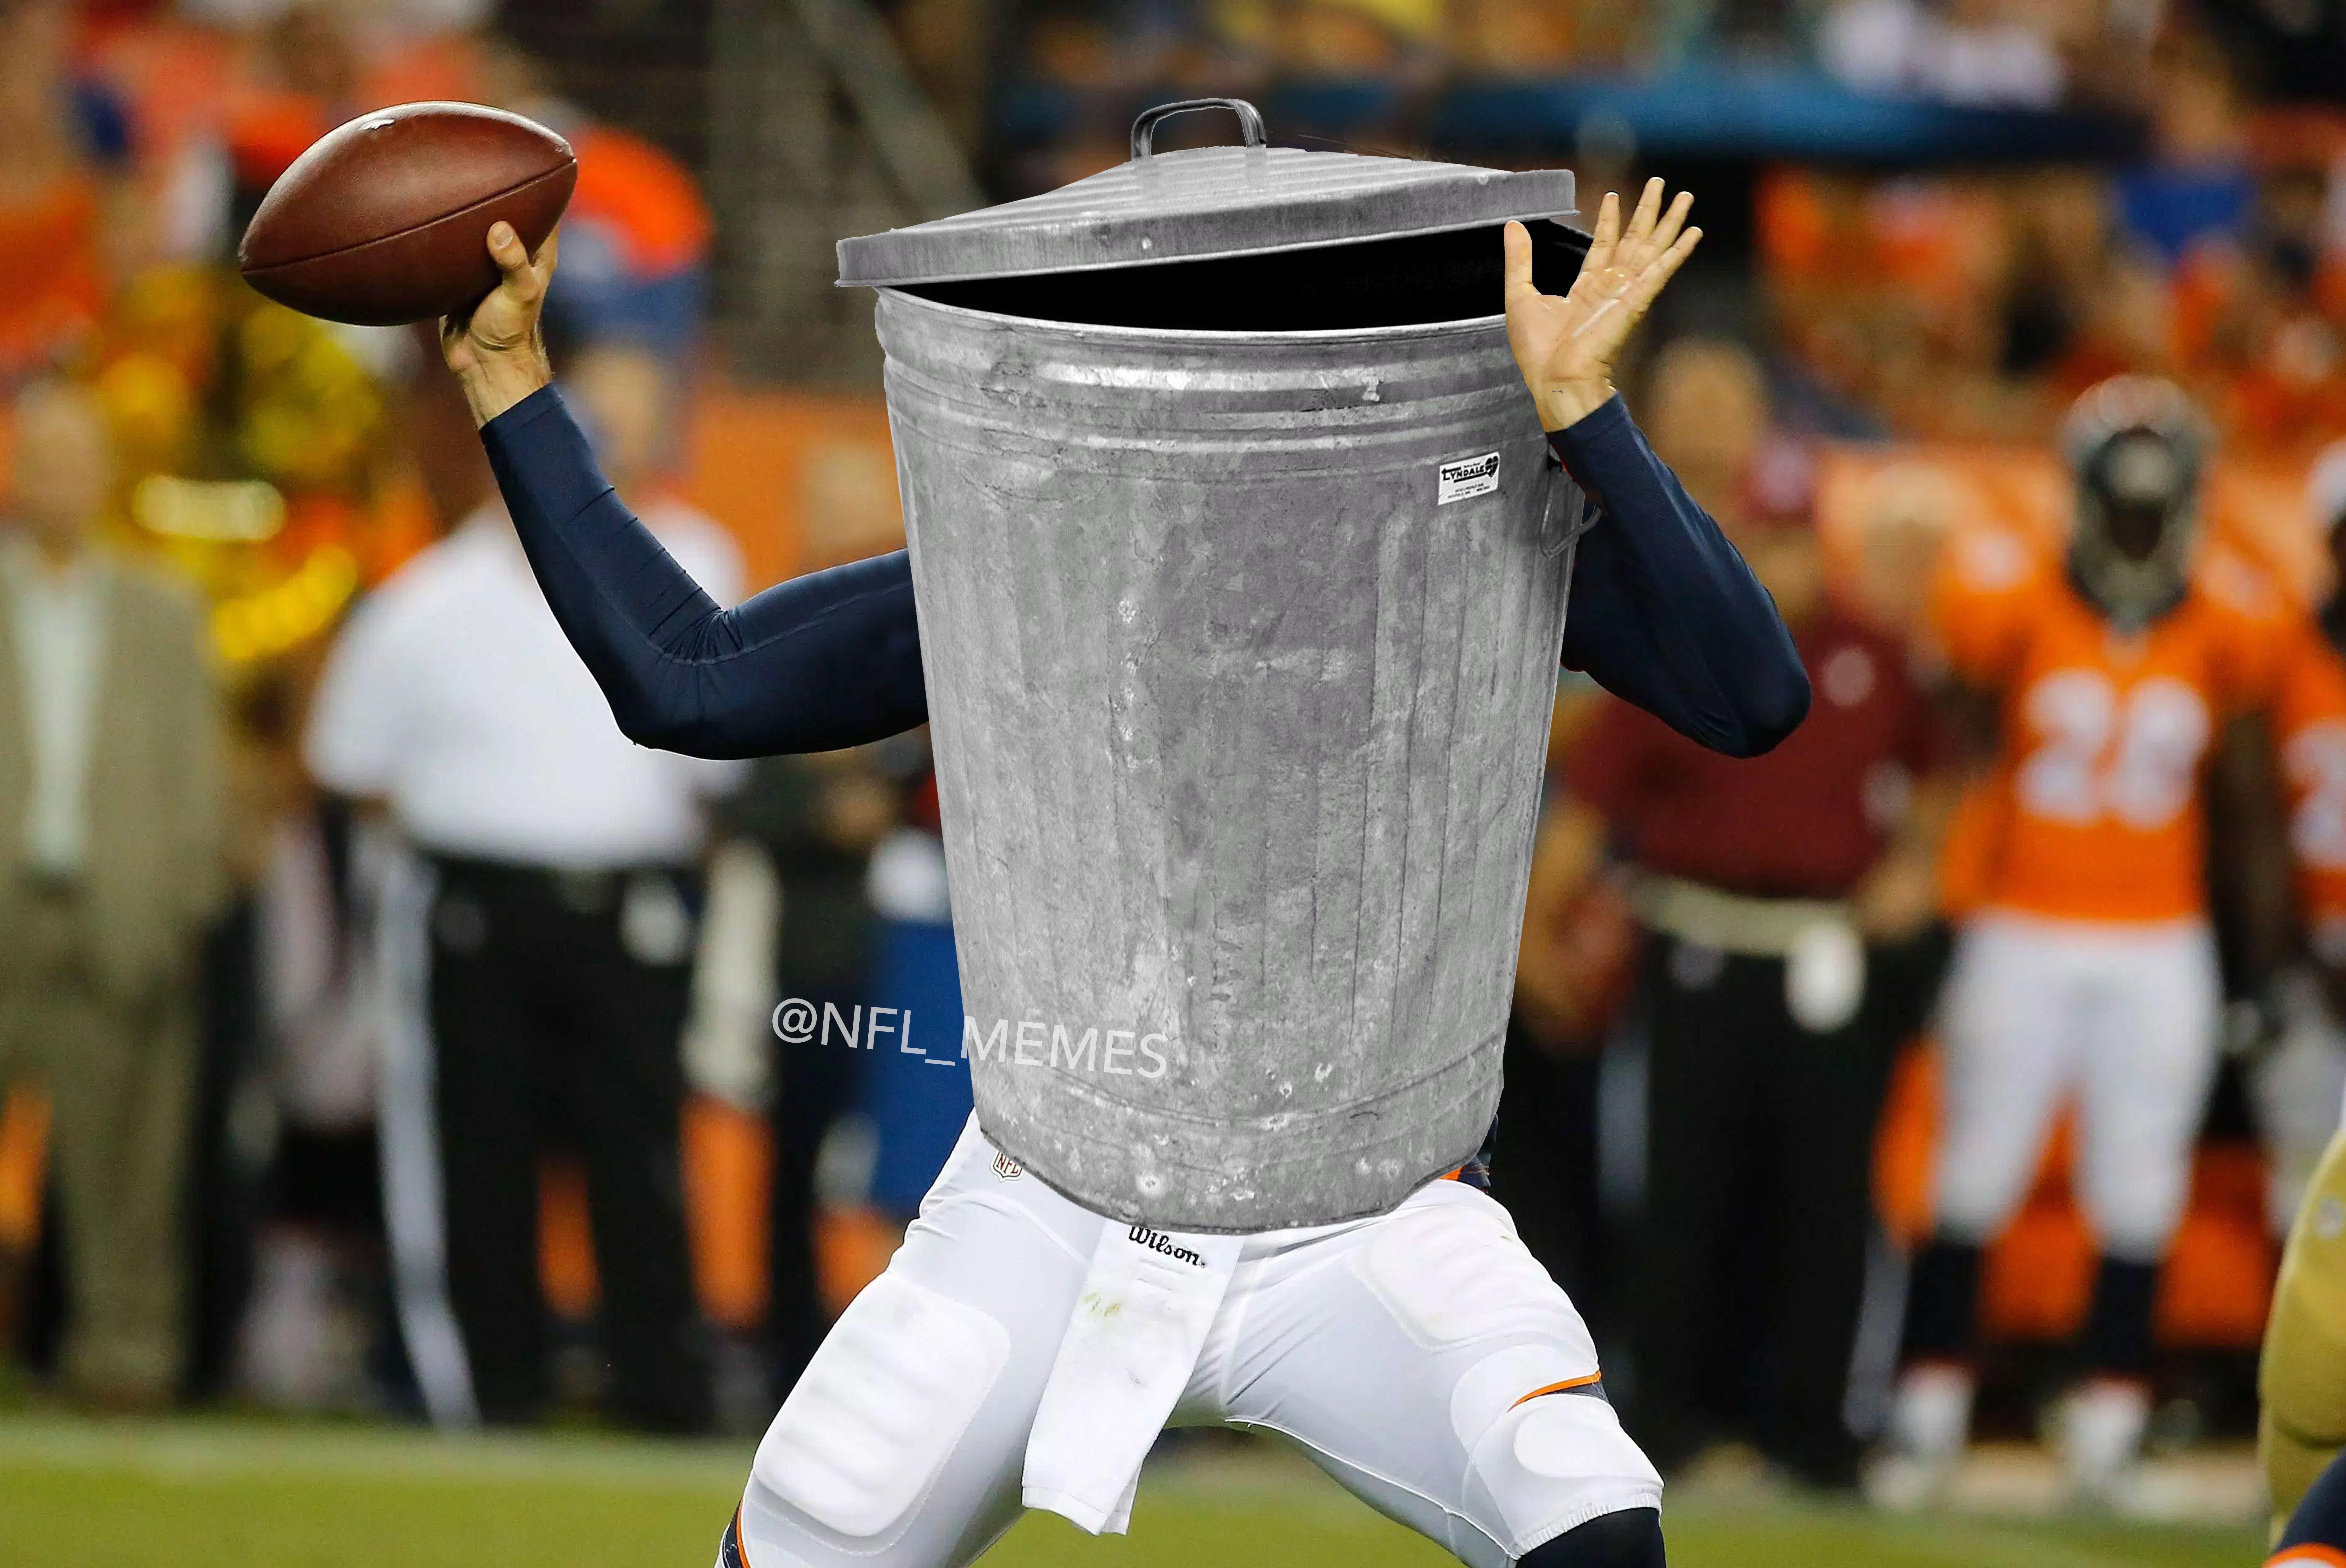 Breaking News the Broncos suck